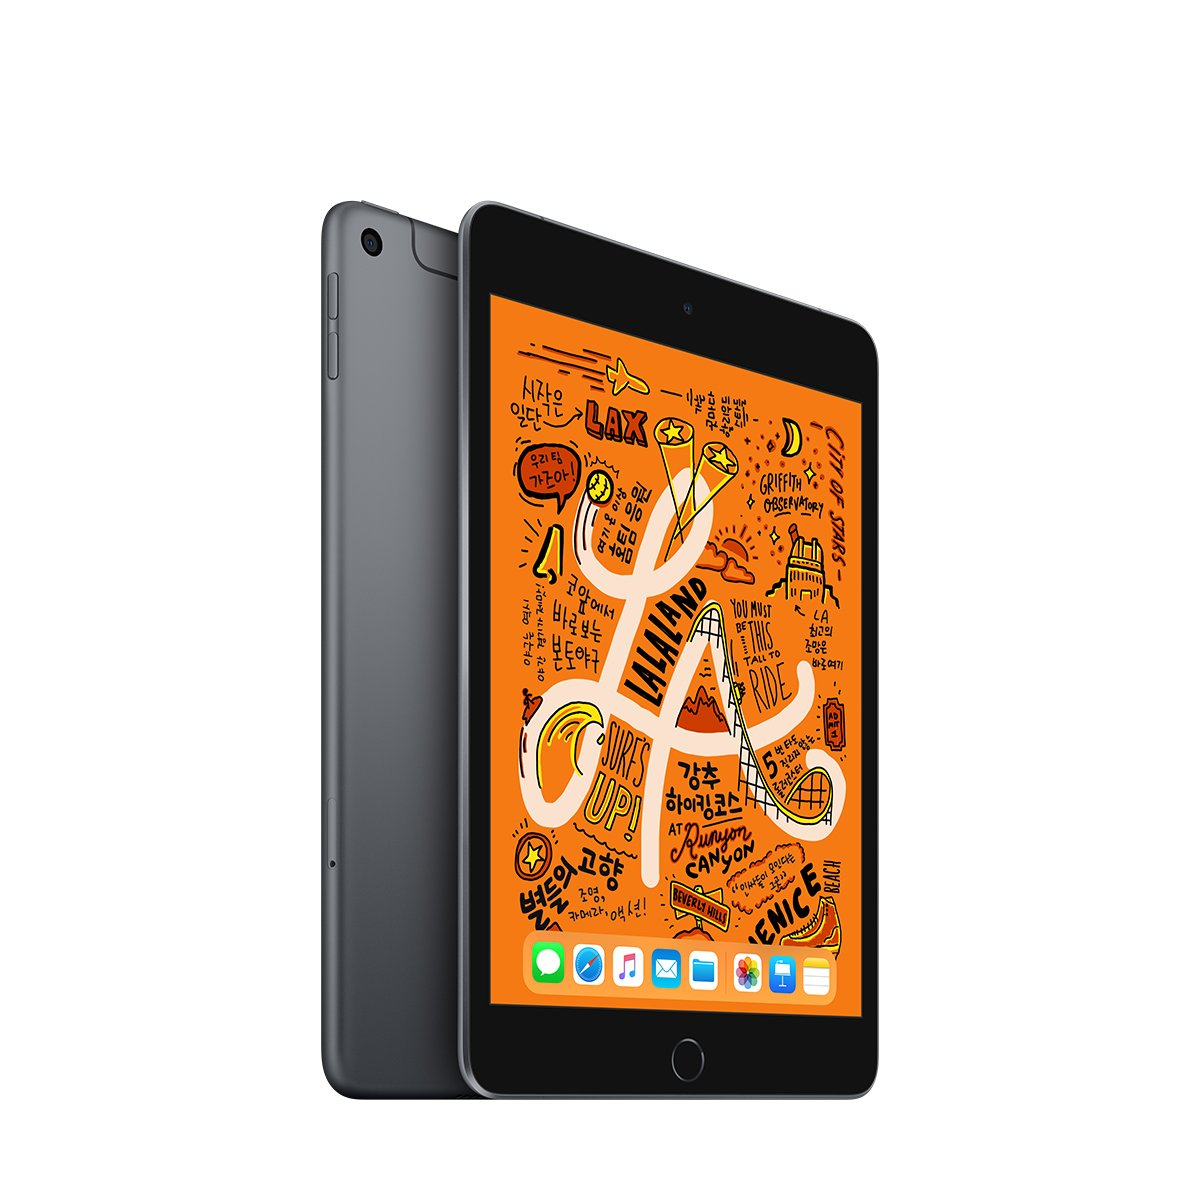 iPad mini5세대 256GB 스페이스 그레이 셀룰러MUXC2KH/A, 단일상품